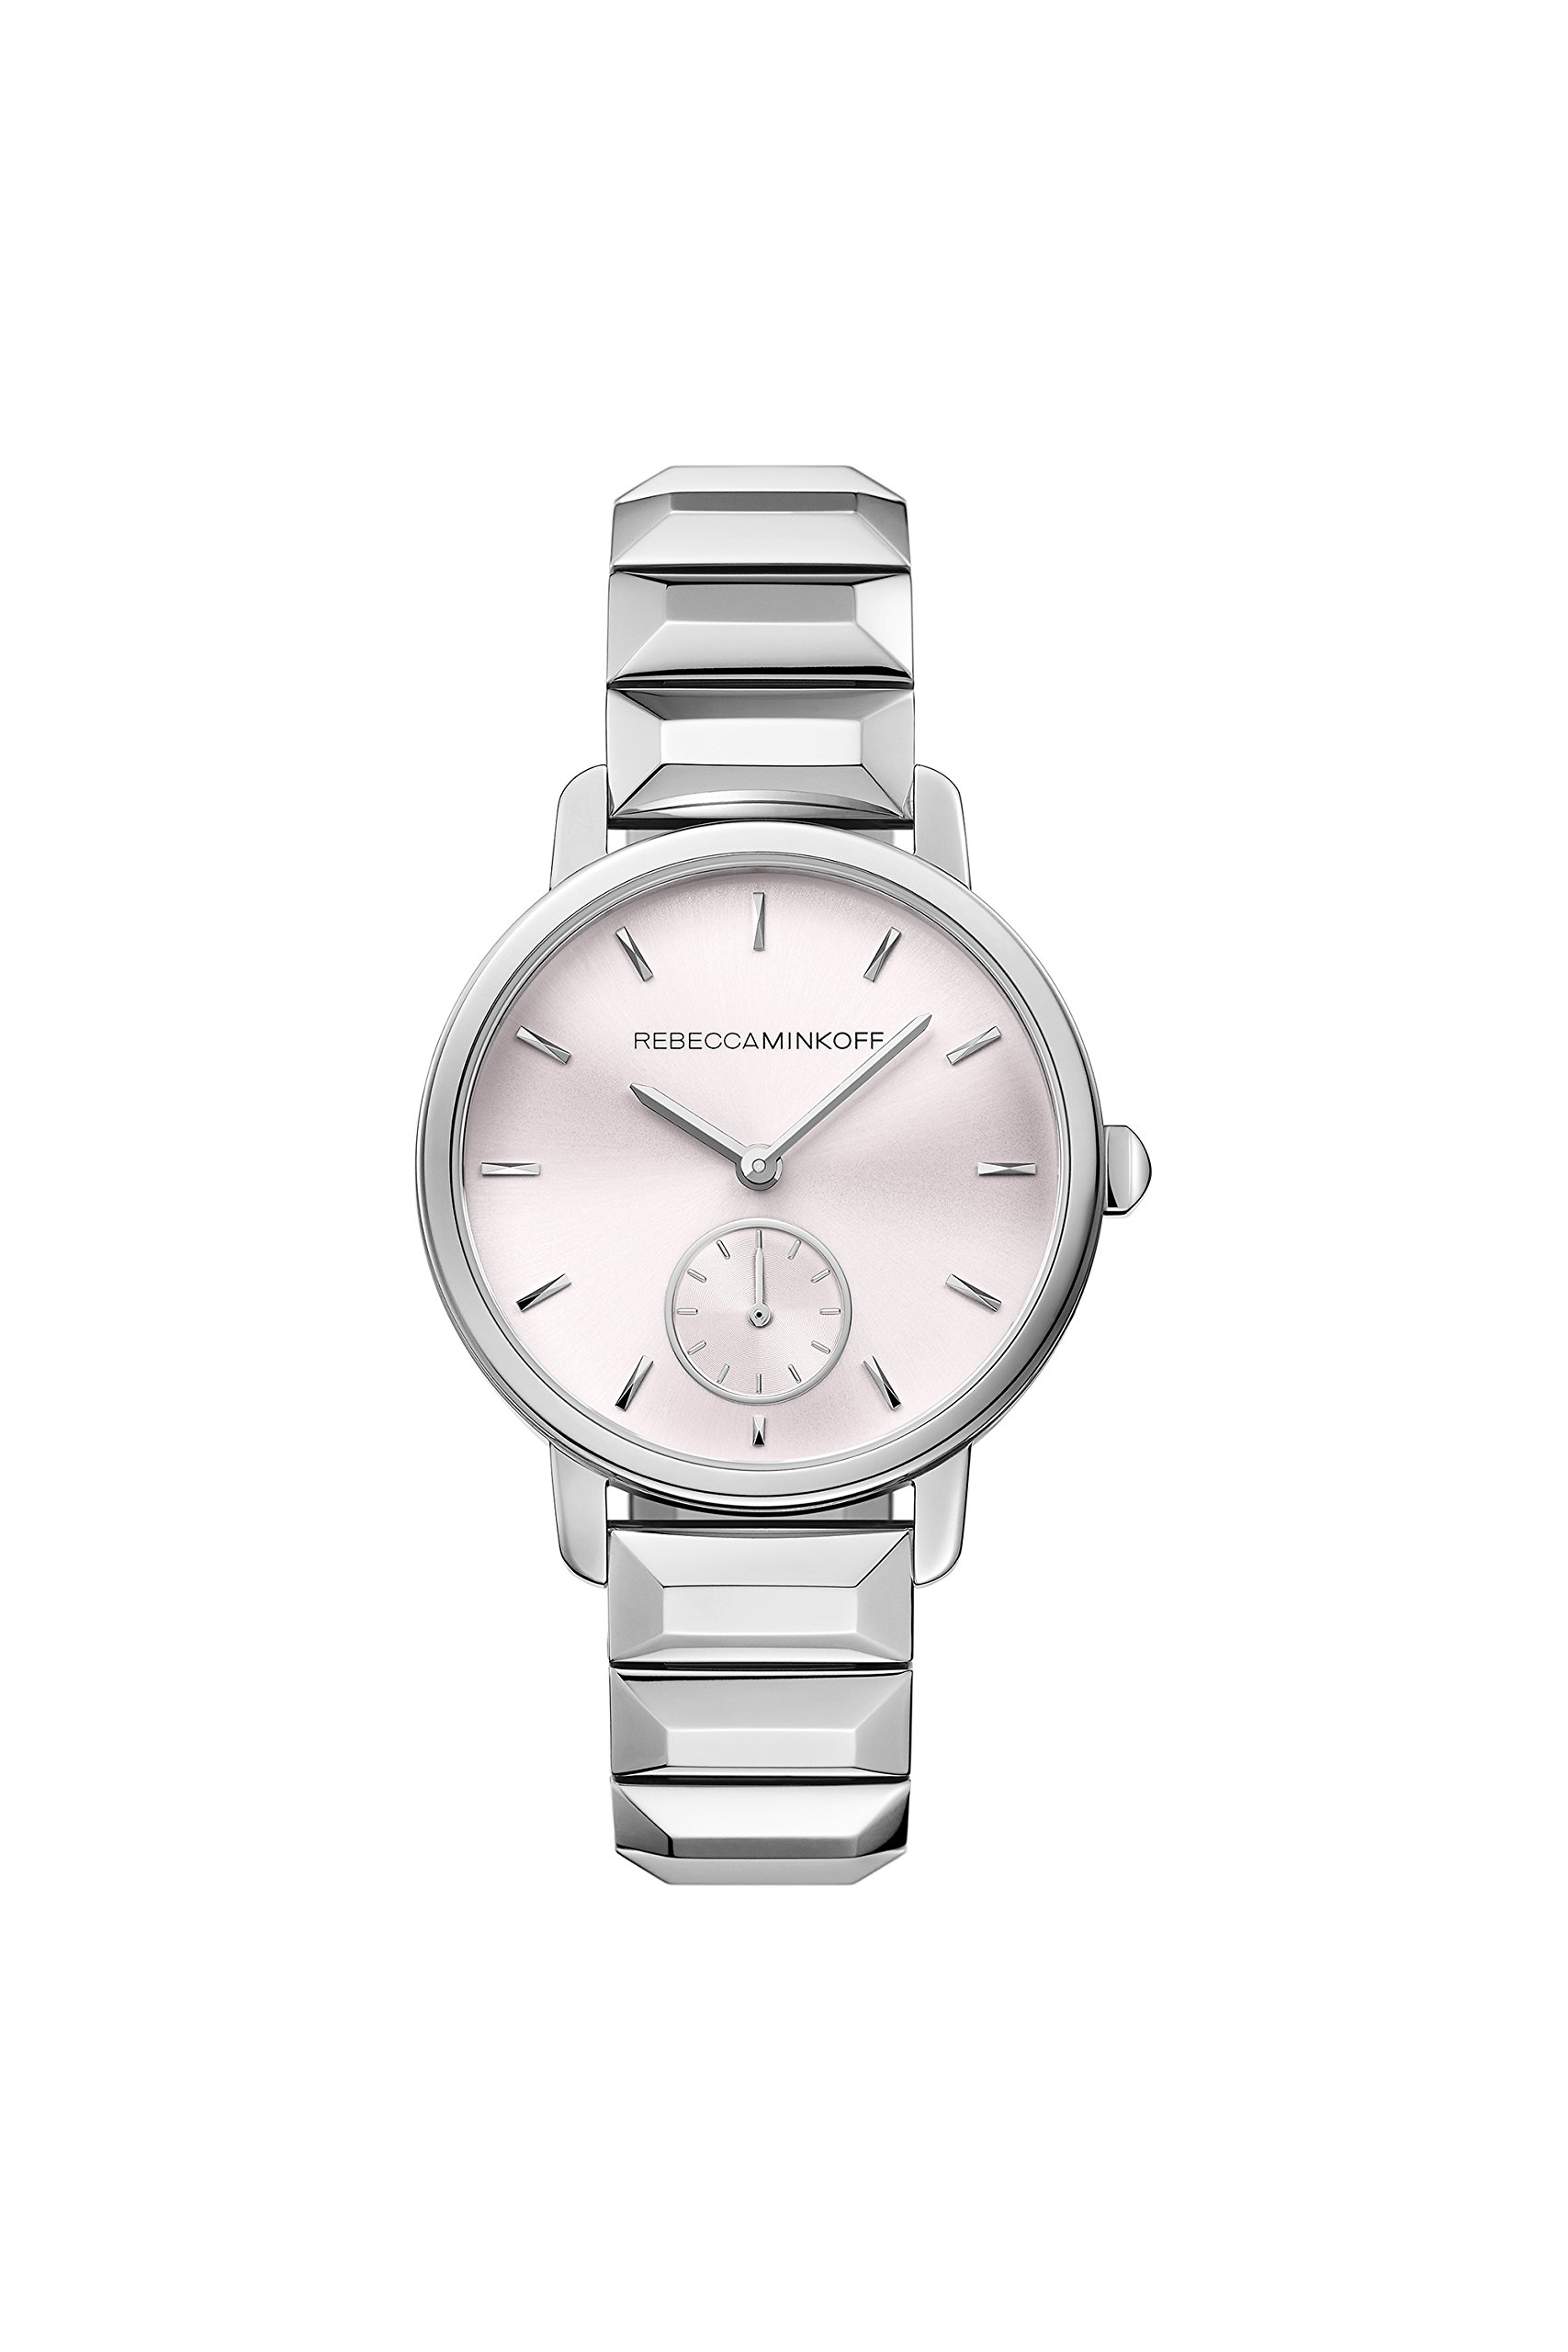 Rebecca Minkoff BFFL 2200032 Silver Tone Bracelet Watch